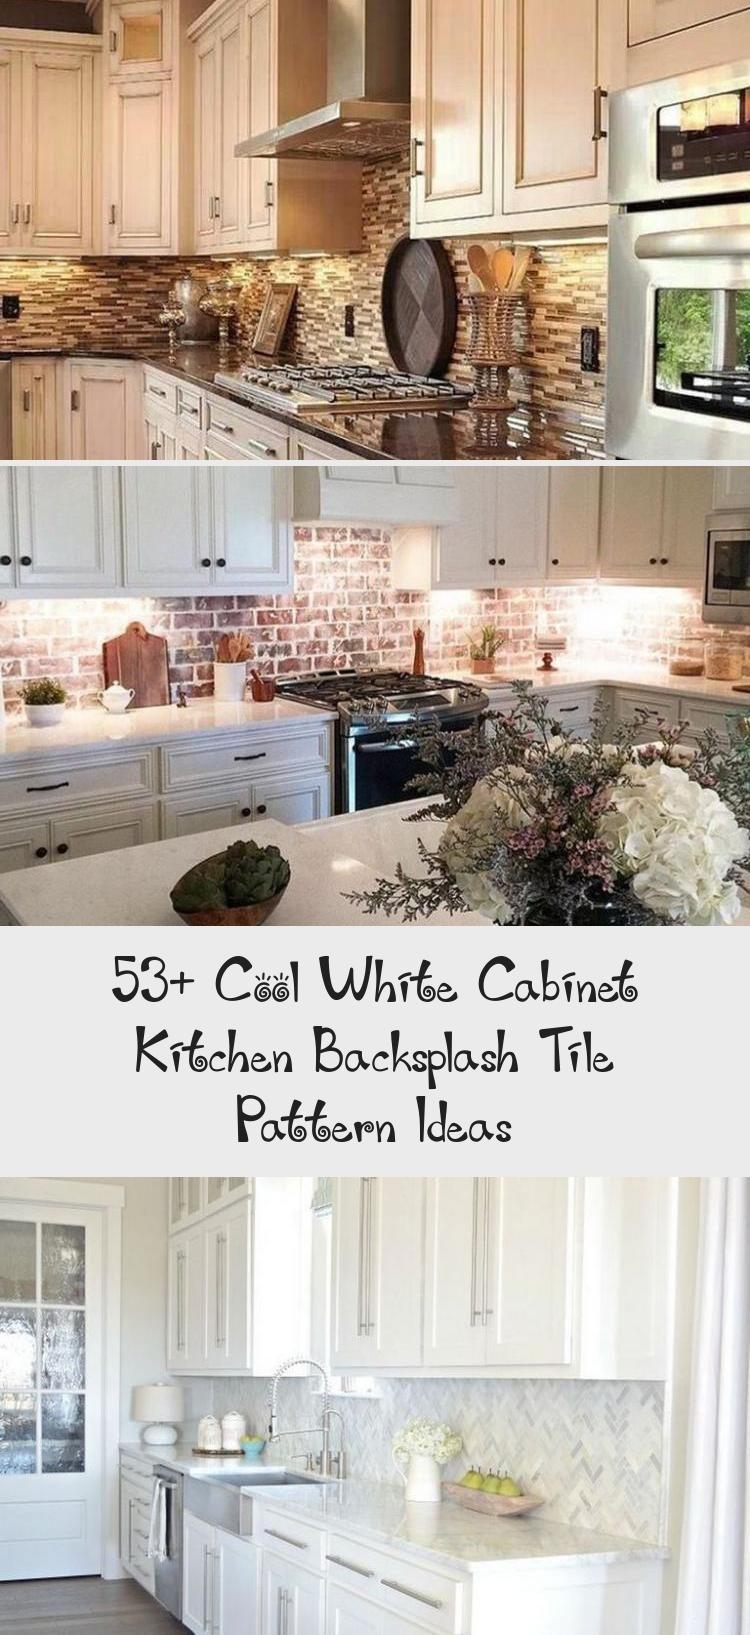 53 cool white kitchen backsplash tile pattern